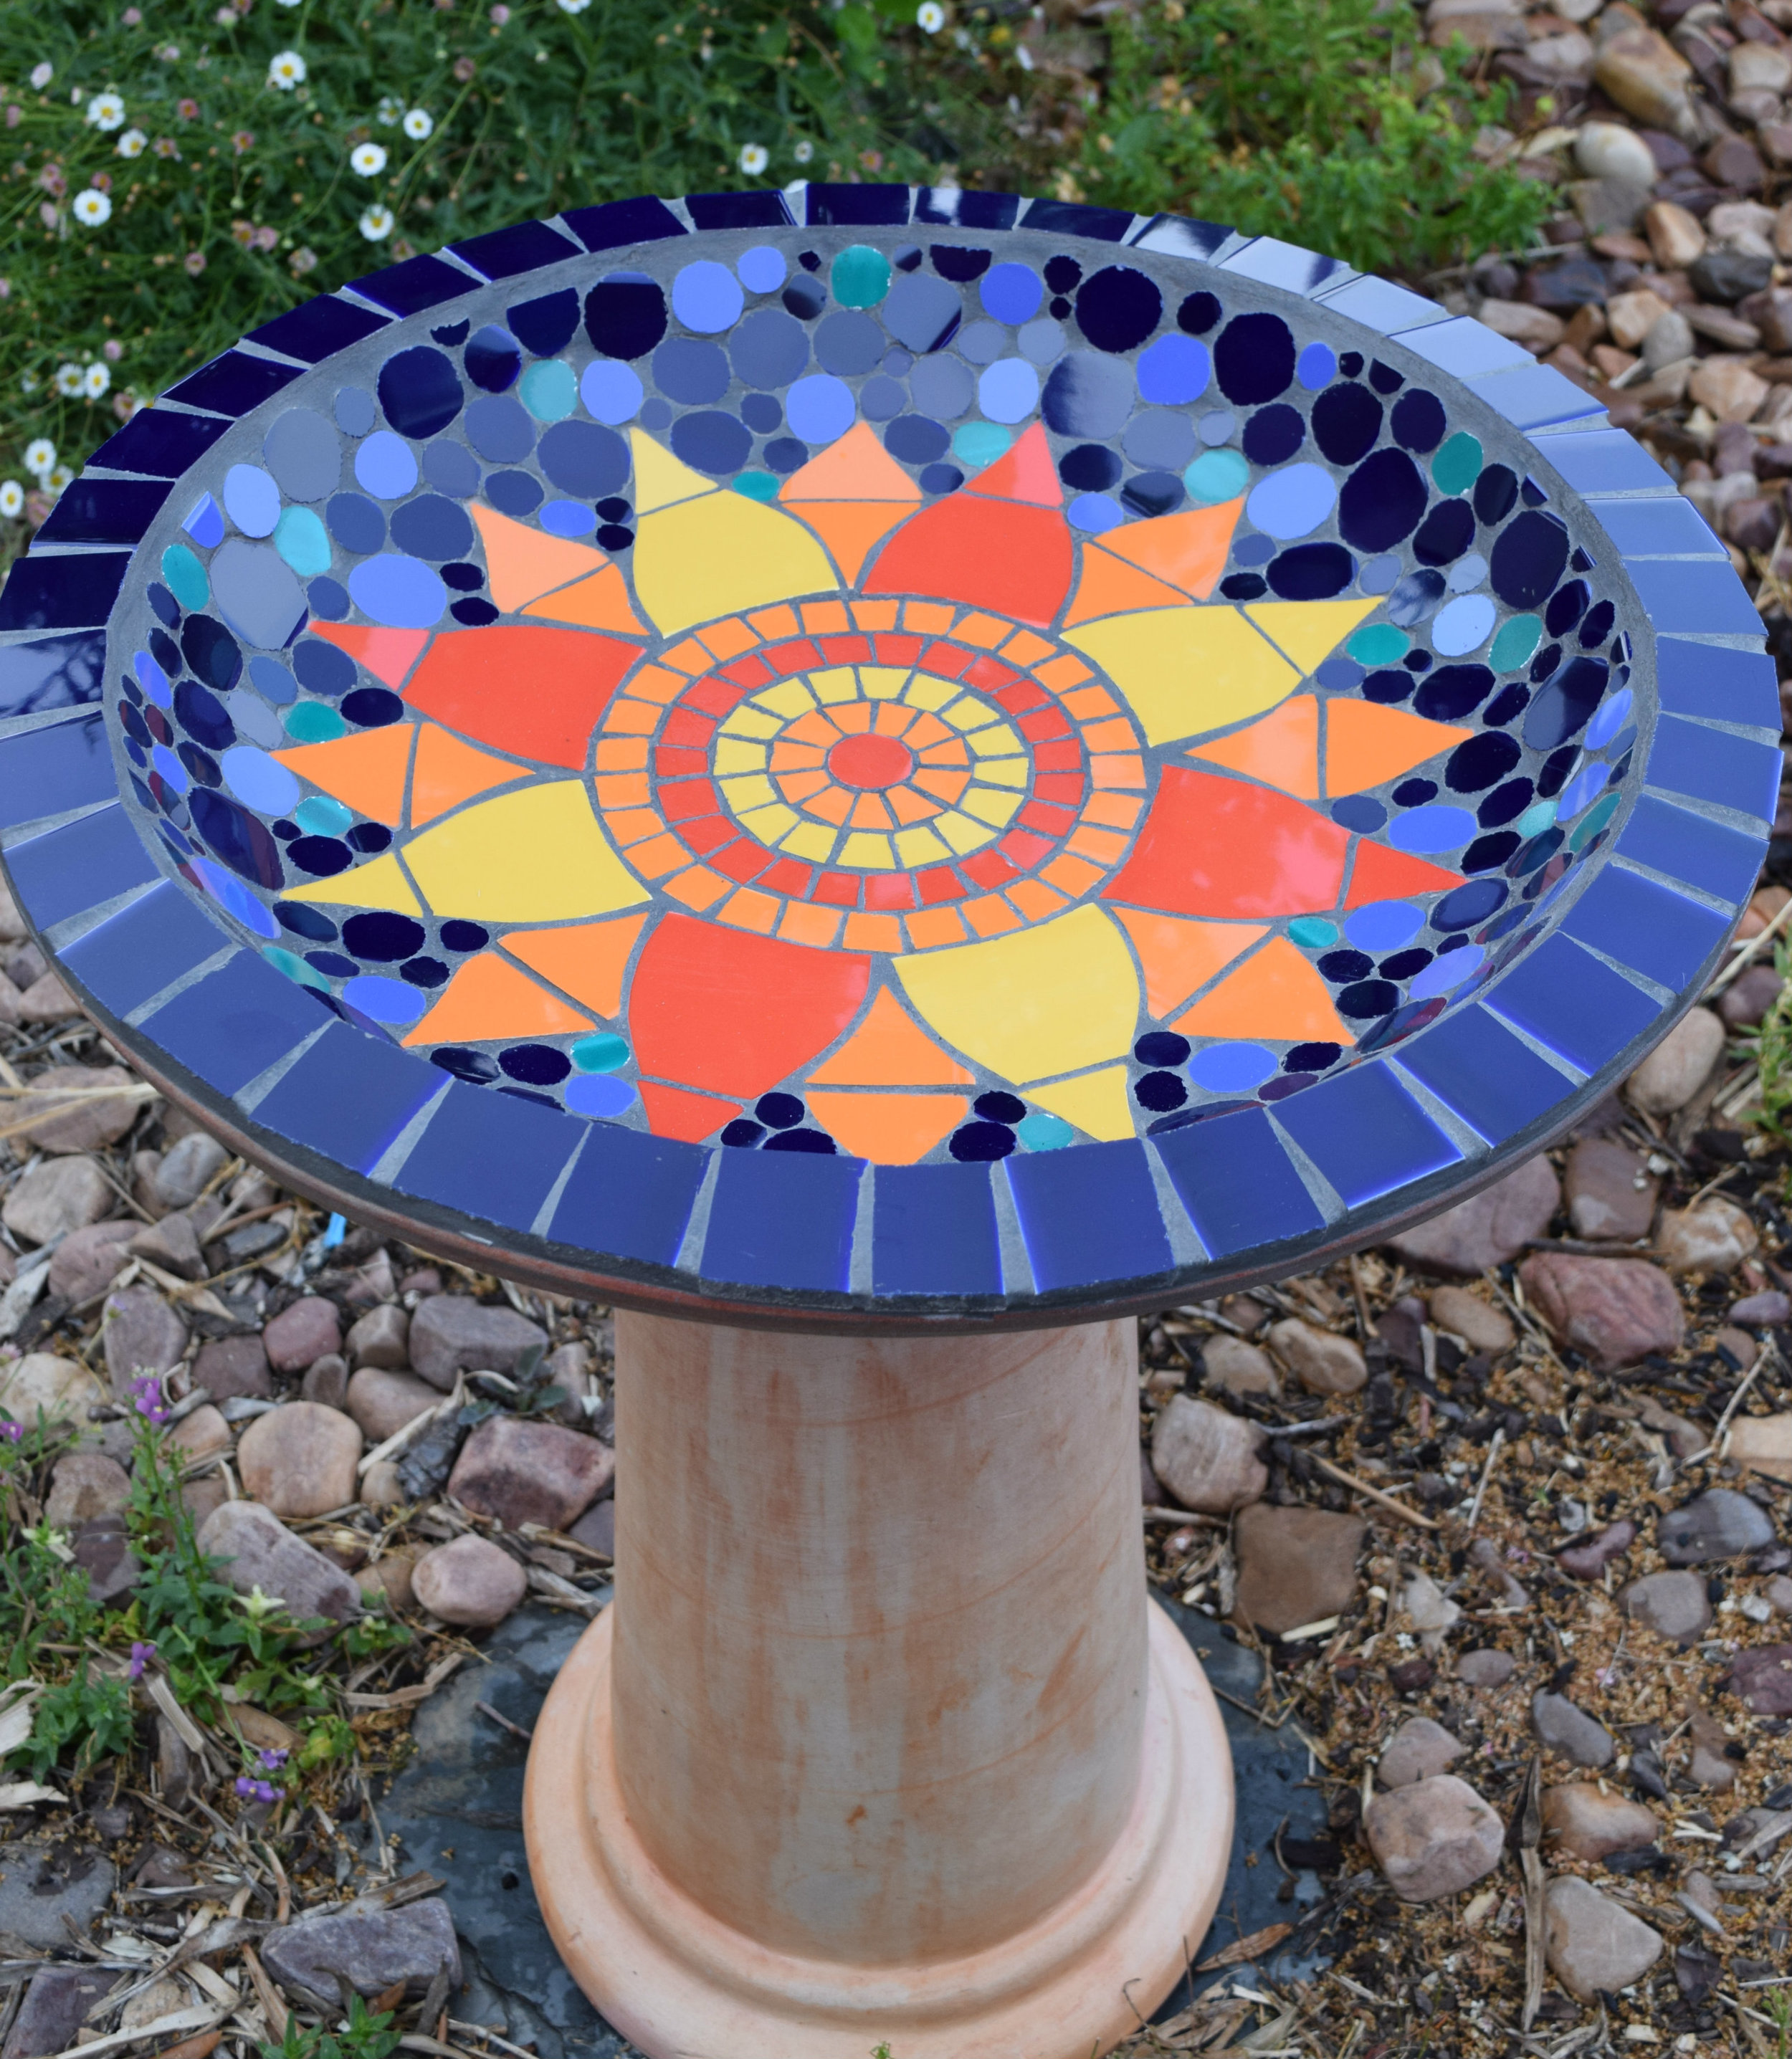 Flower Birdbath (Commission) (Ceramic)